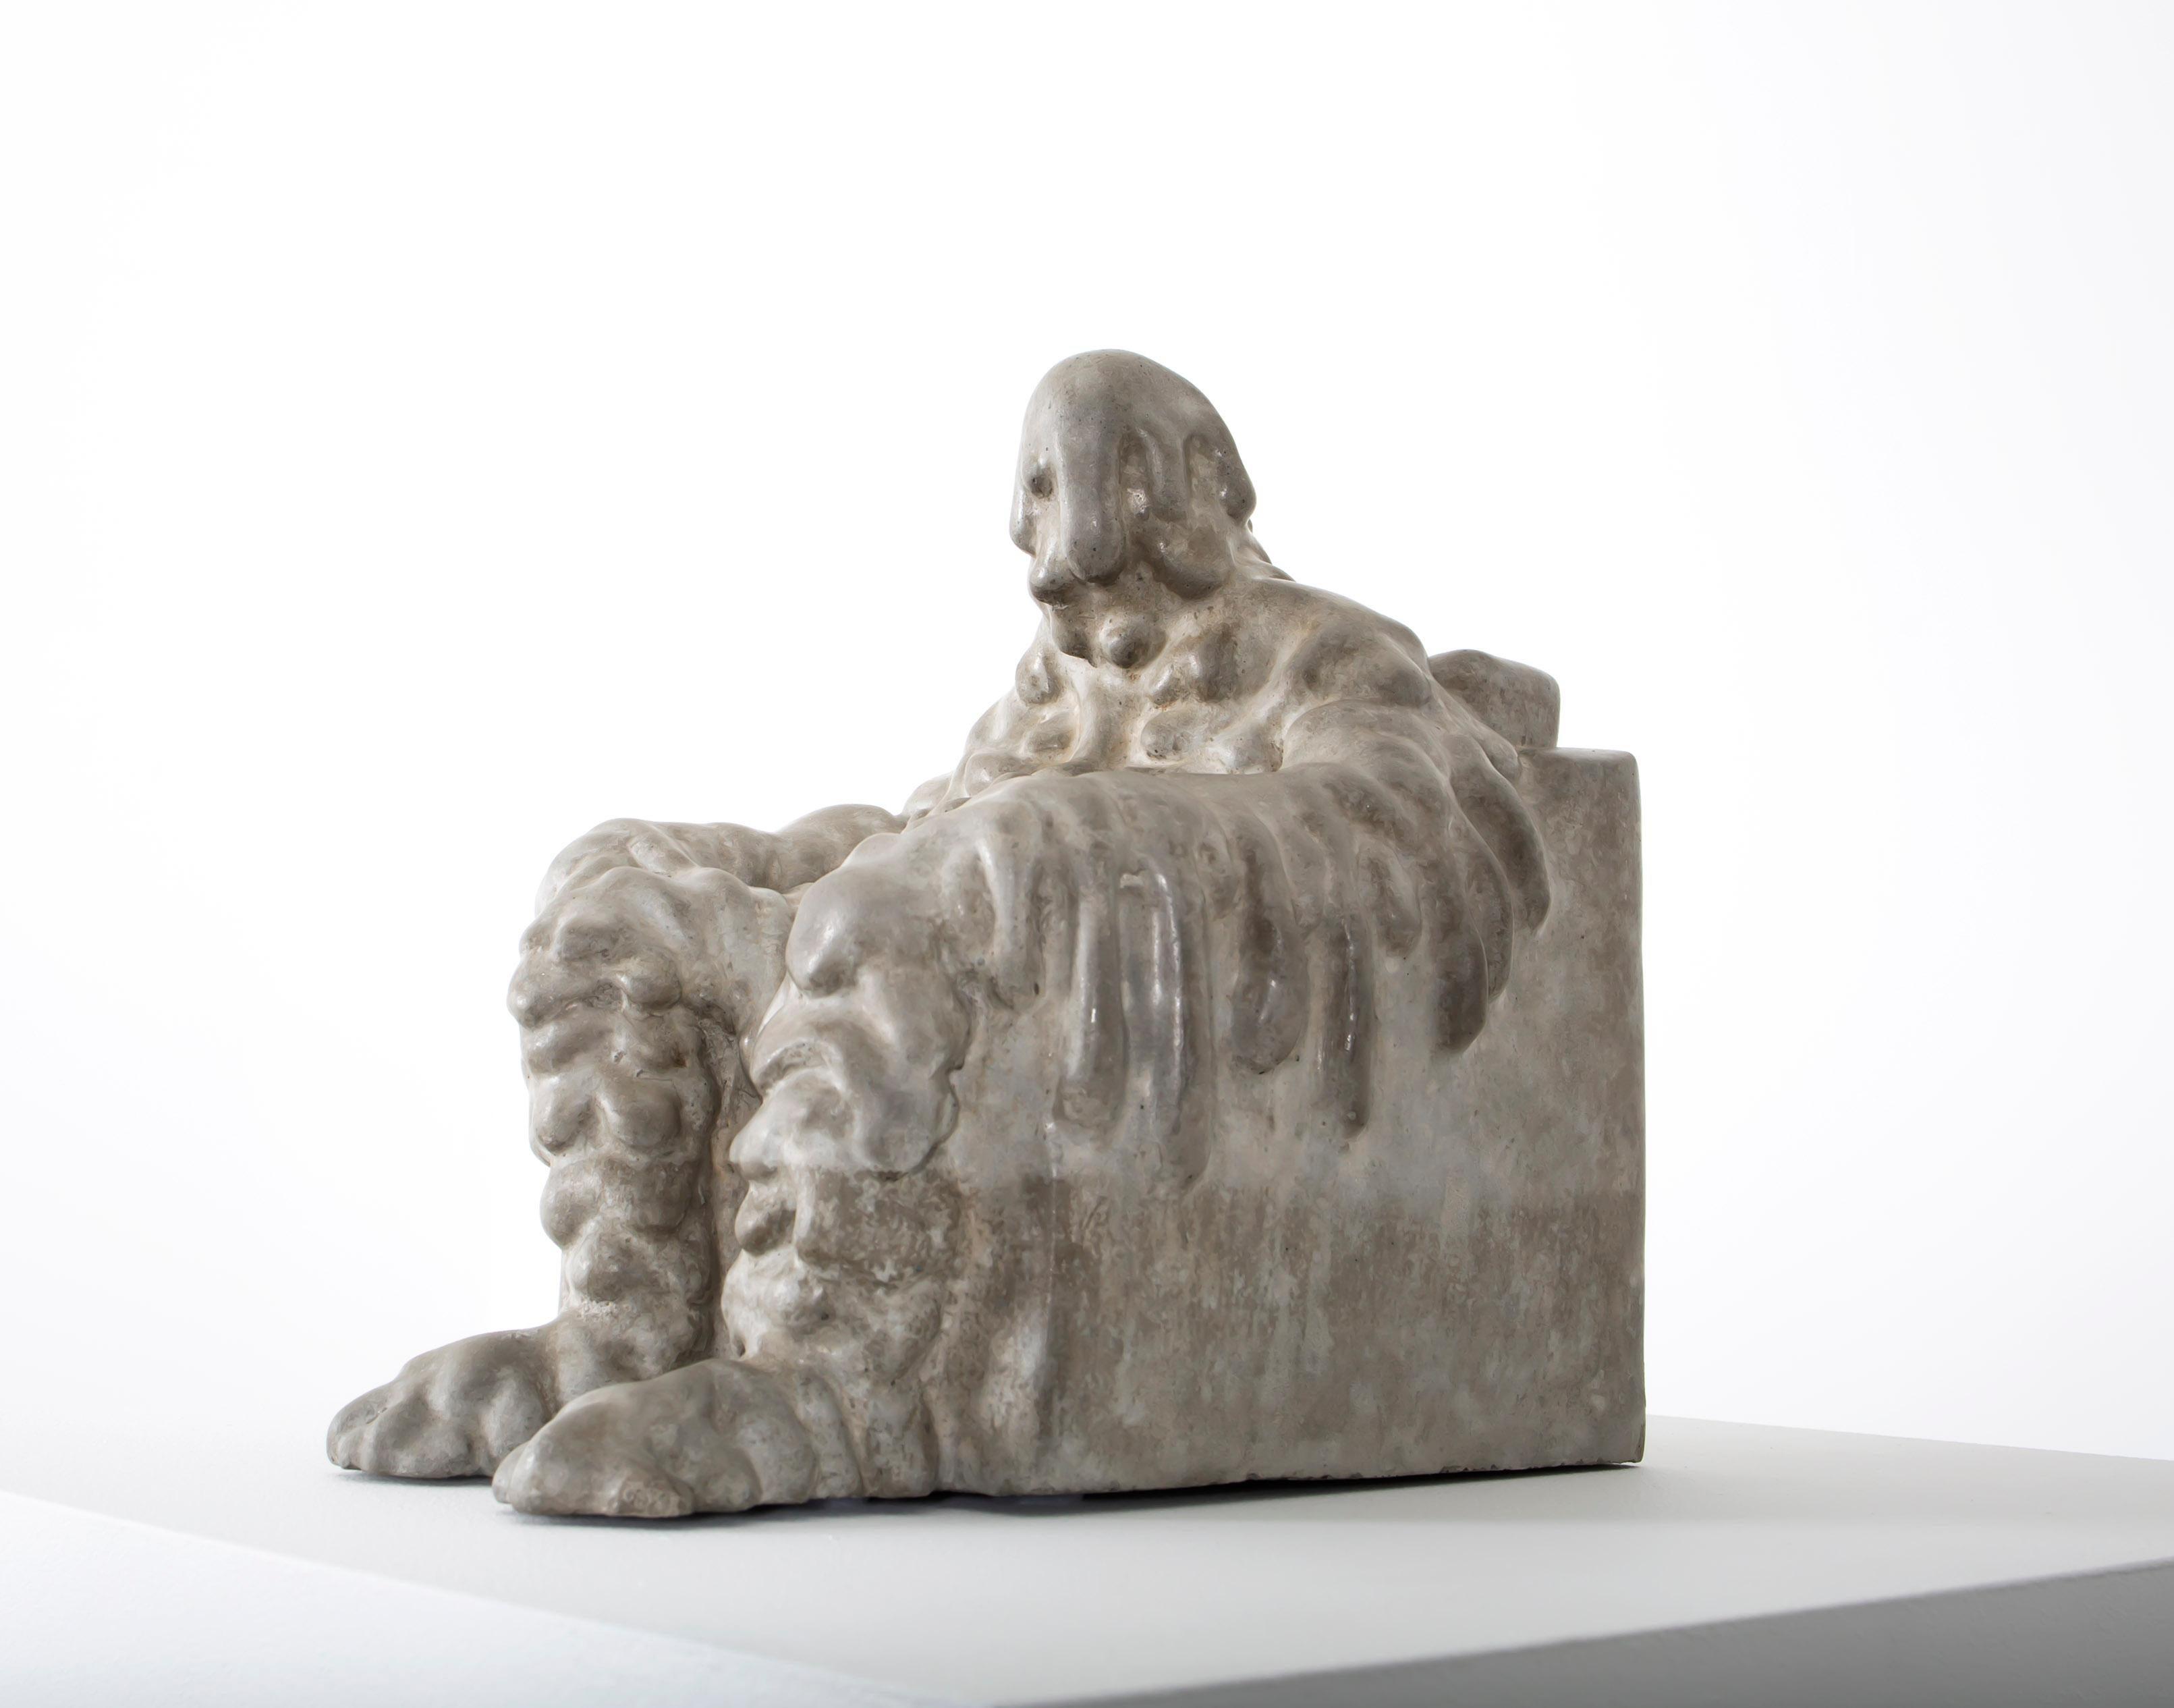 «Melting» Figurative Sculpture by Norwegian artist Jim Darbu